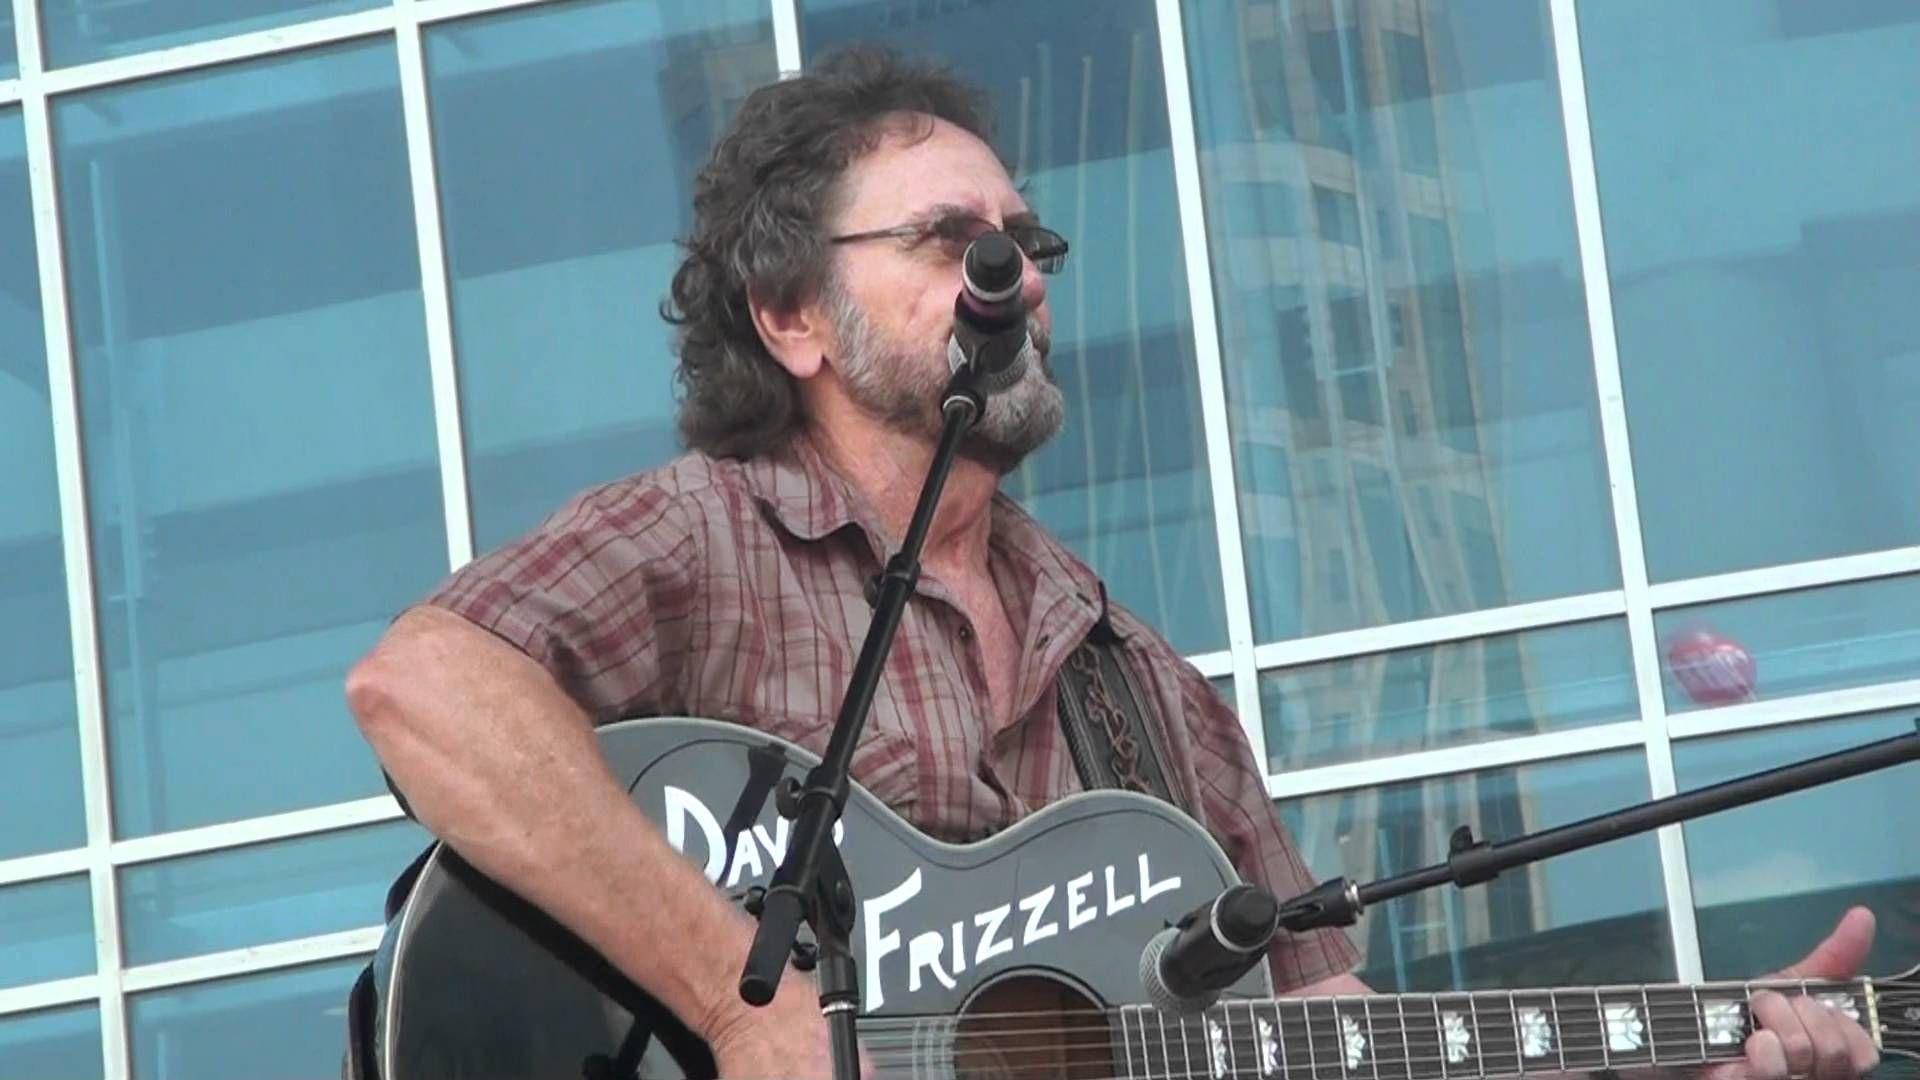 David Frizzell - I Love You A Thousand Ways